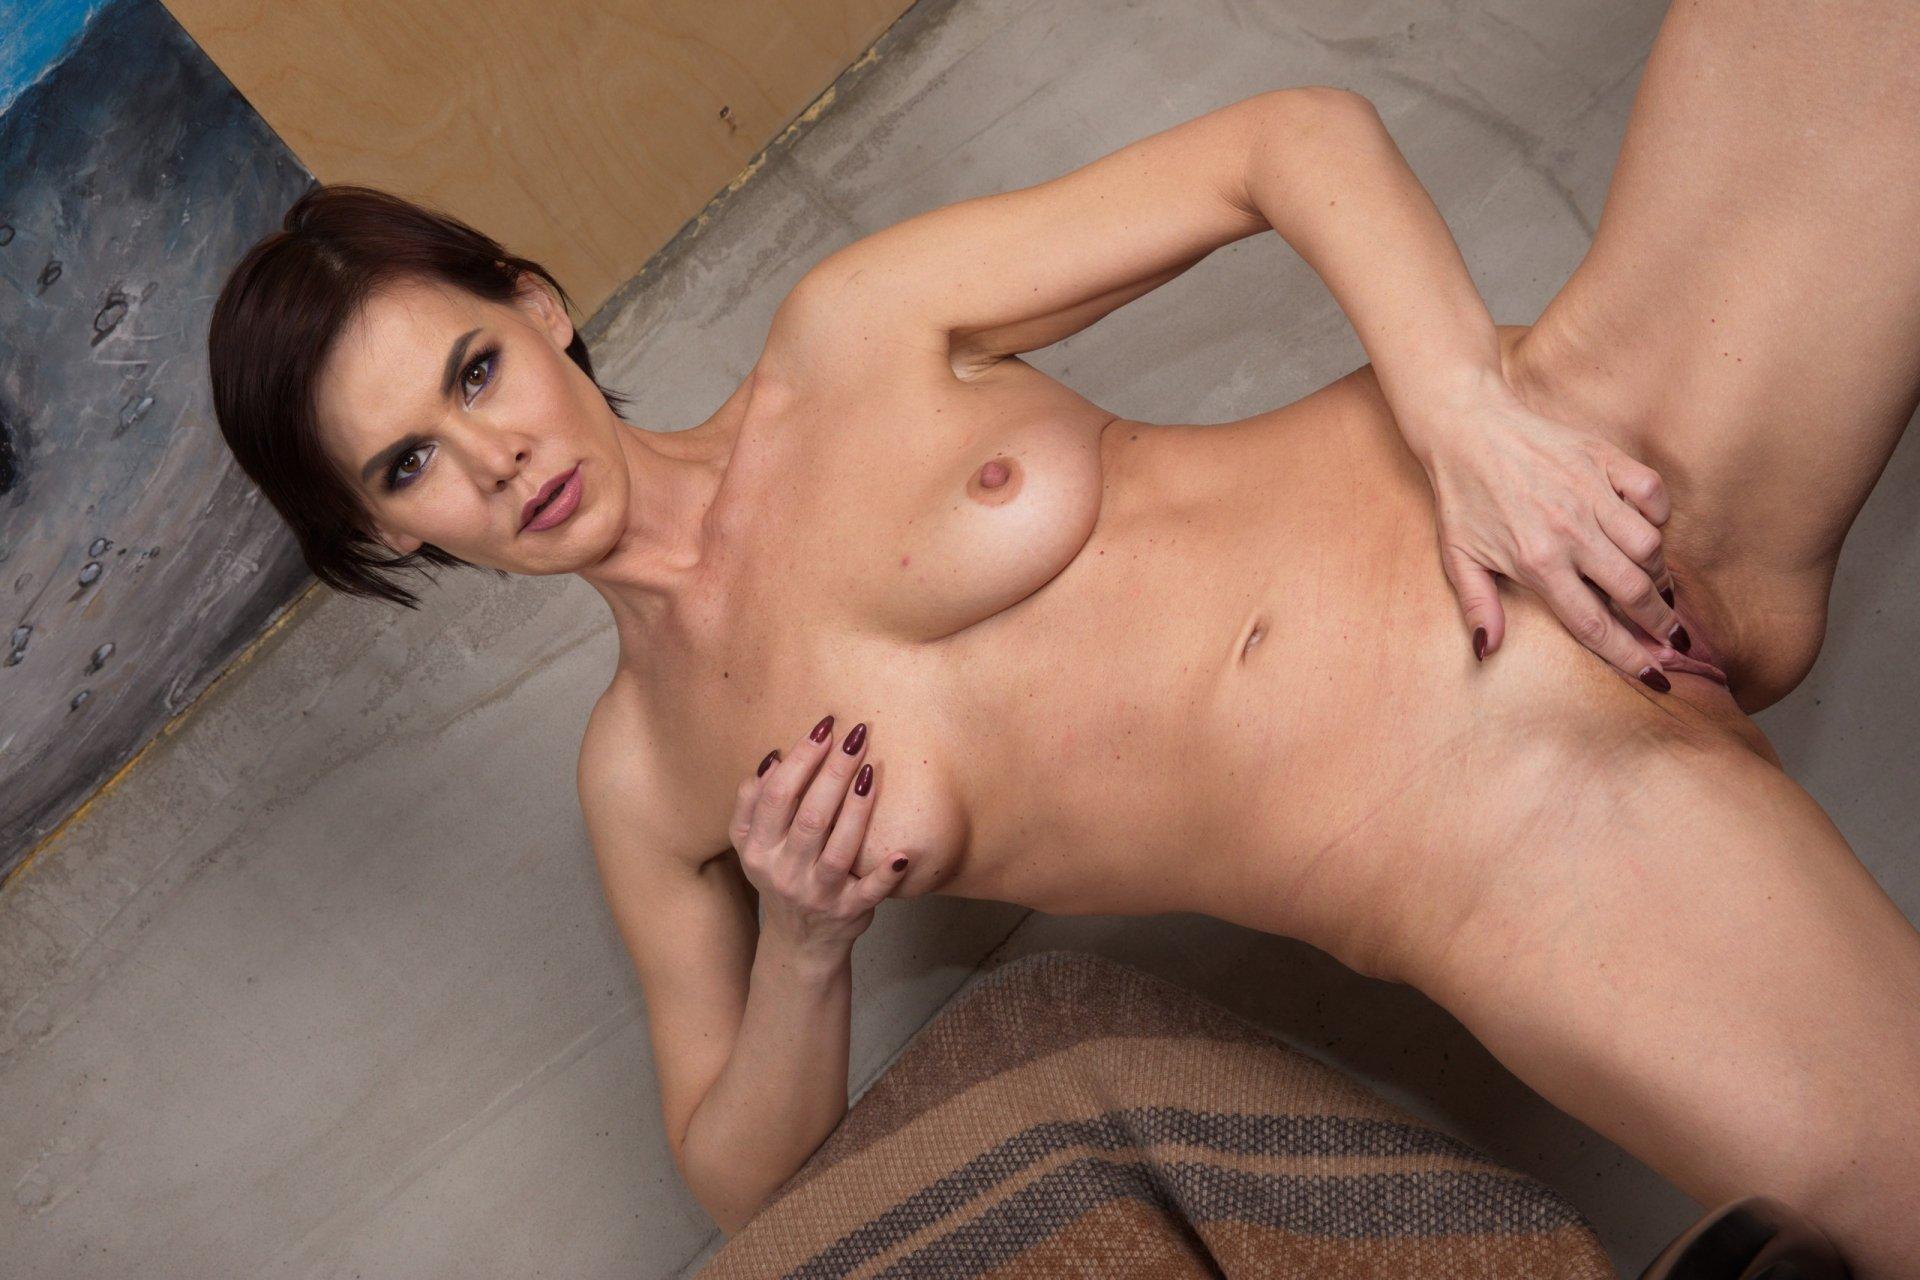 stunningb4bygirl from Warrington,United Kingdom